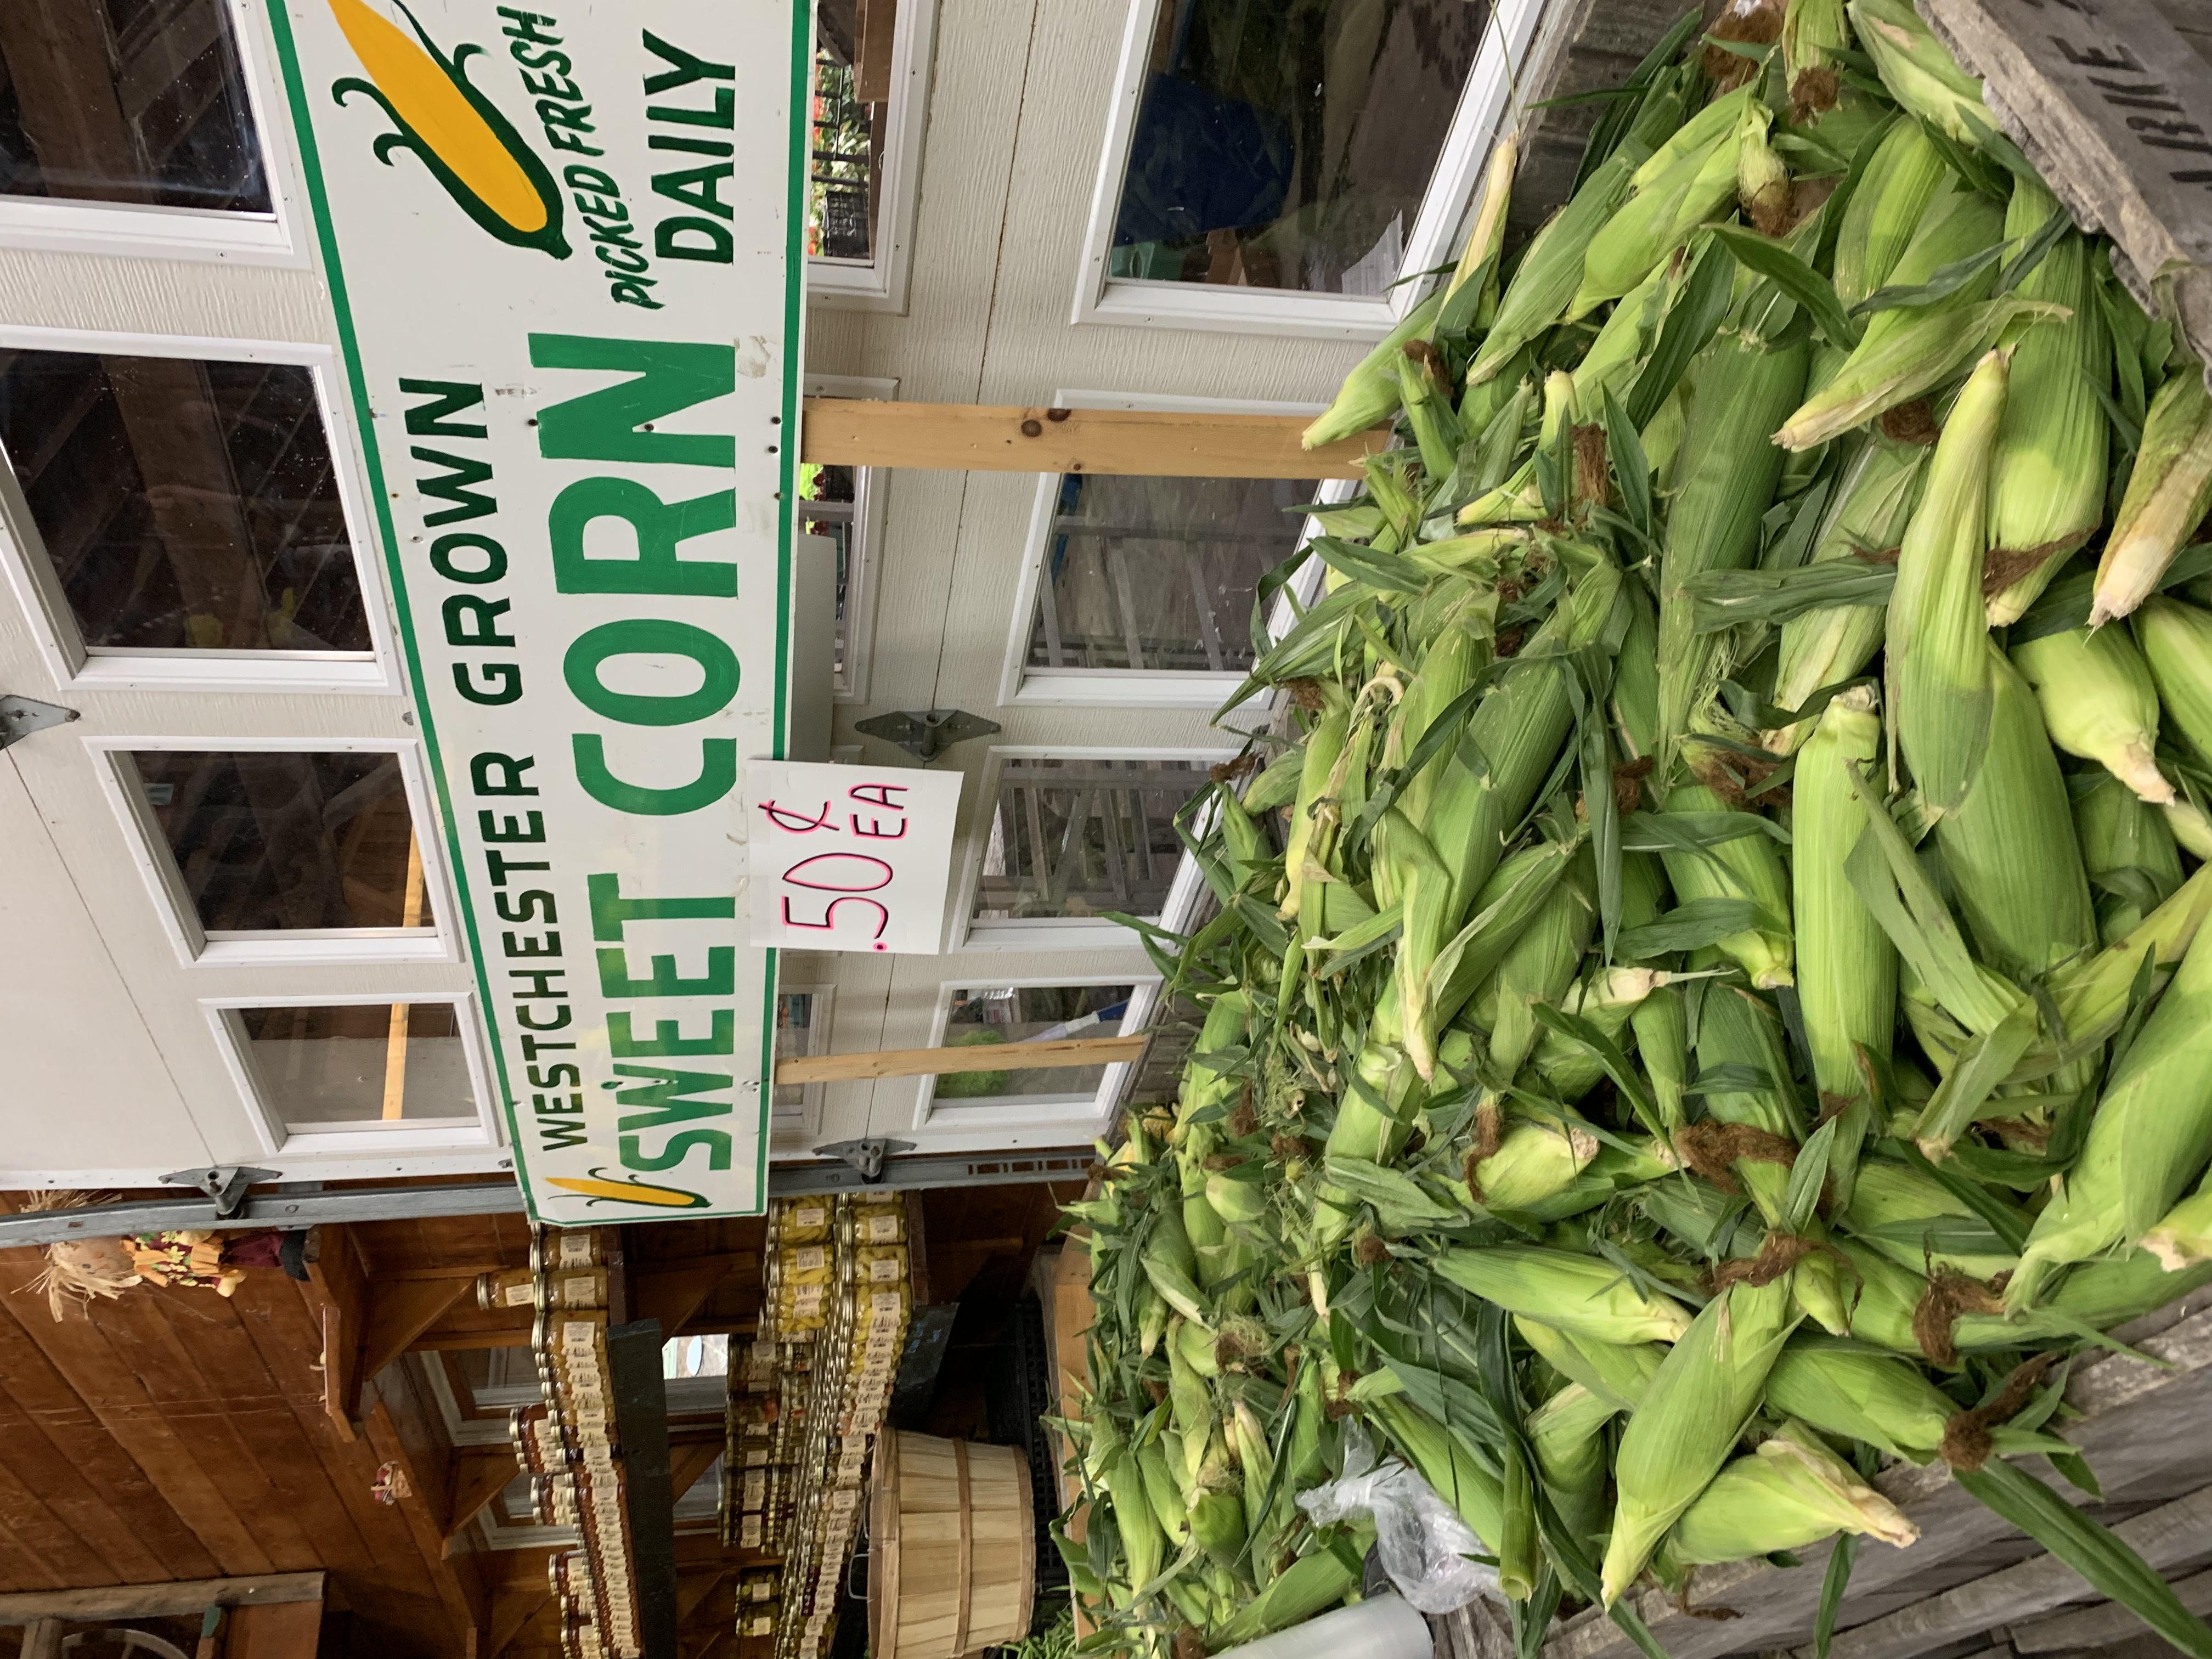 hg corn